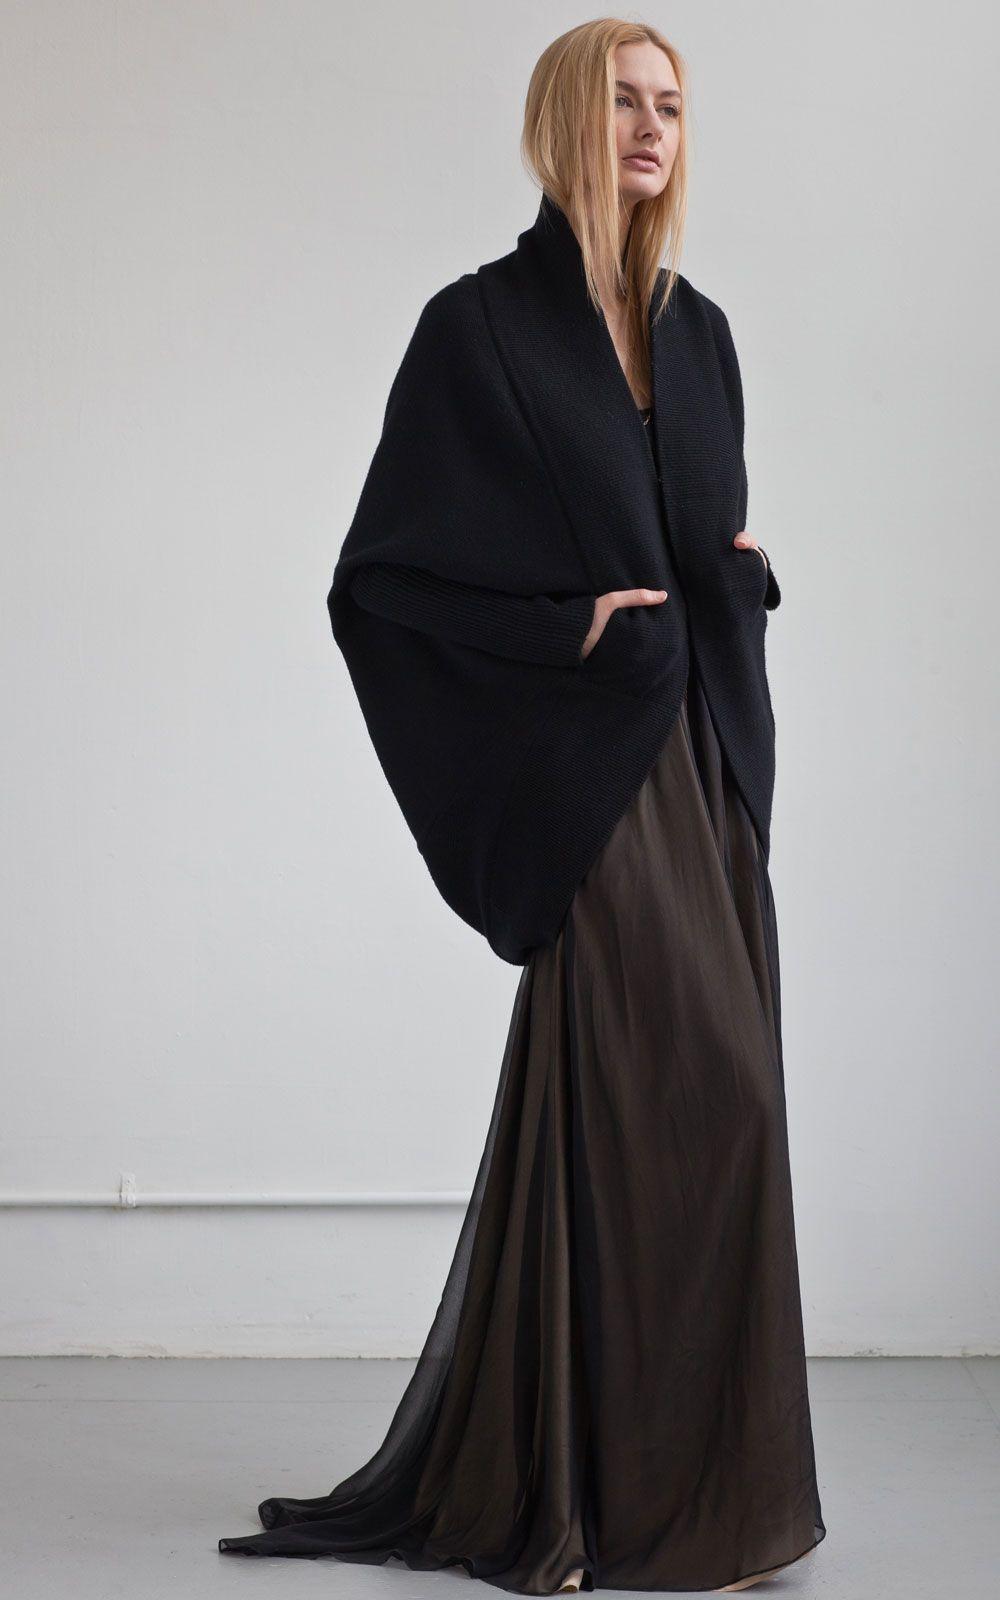 Black cape sweater u long skirt amazing u comfy goddess look